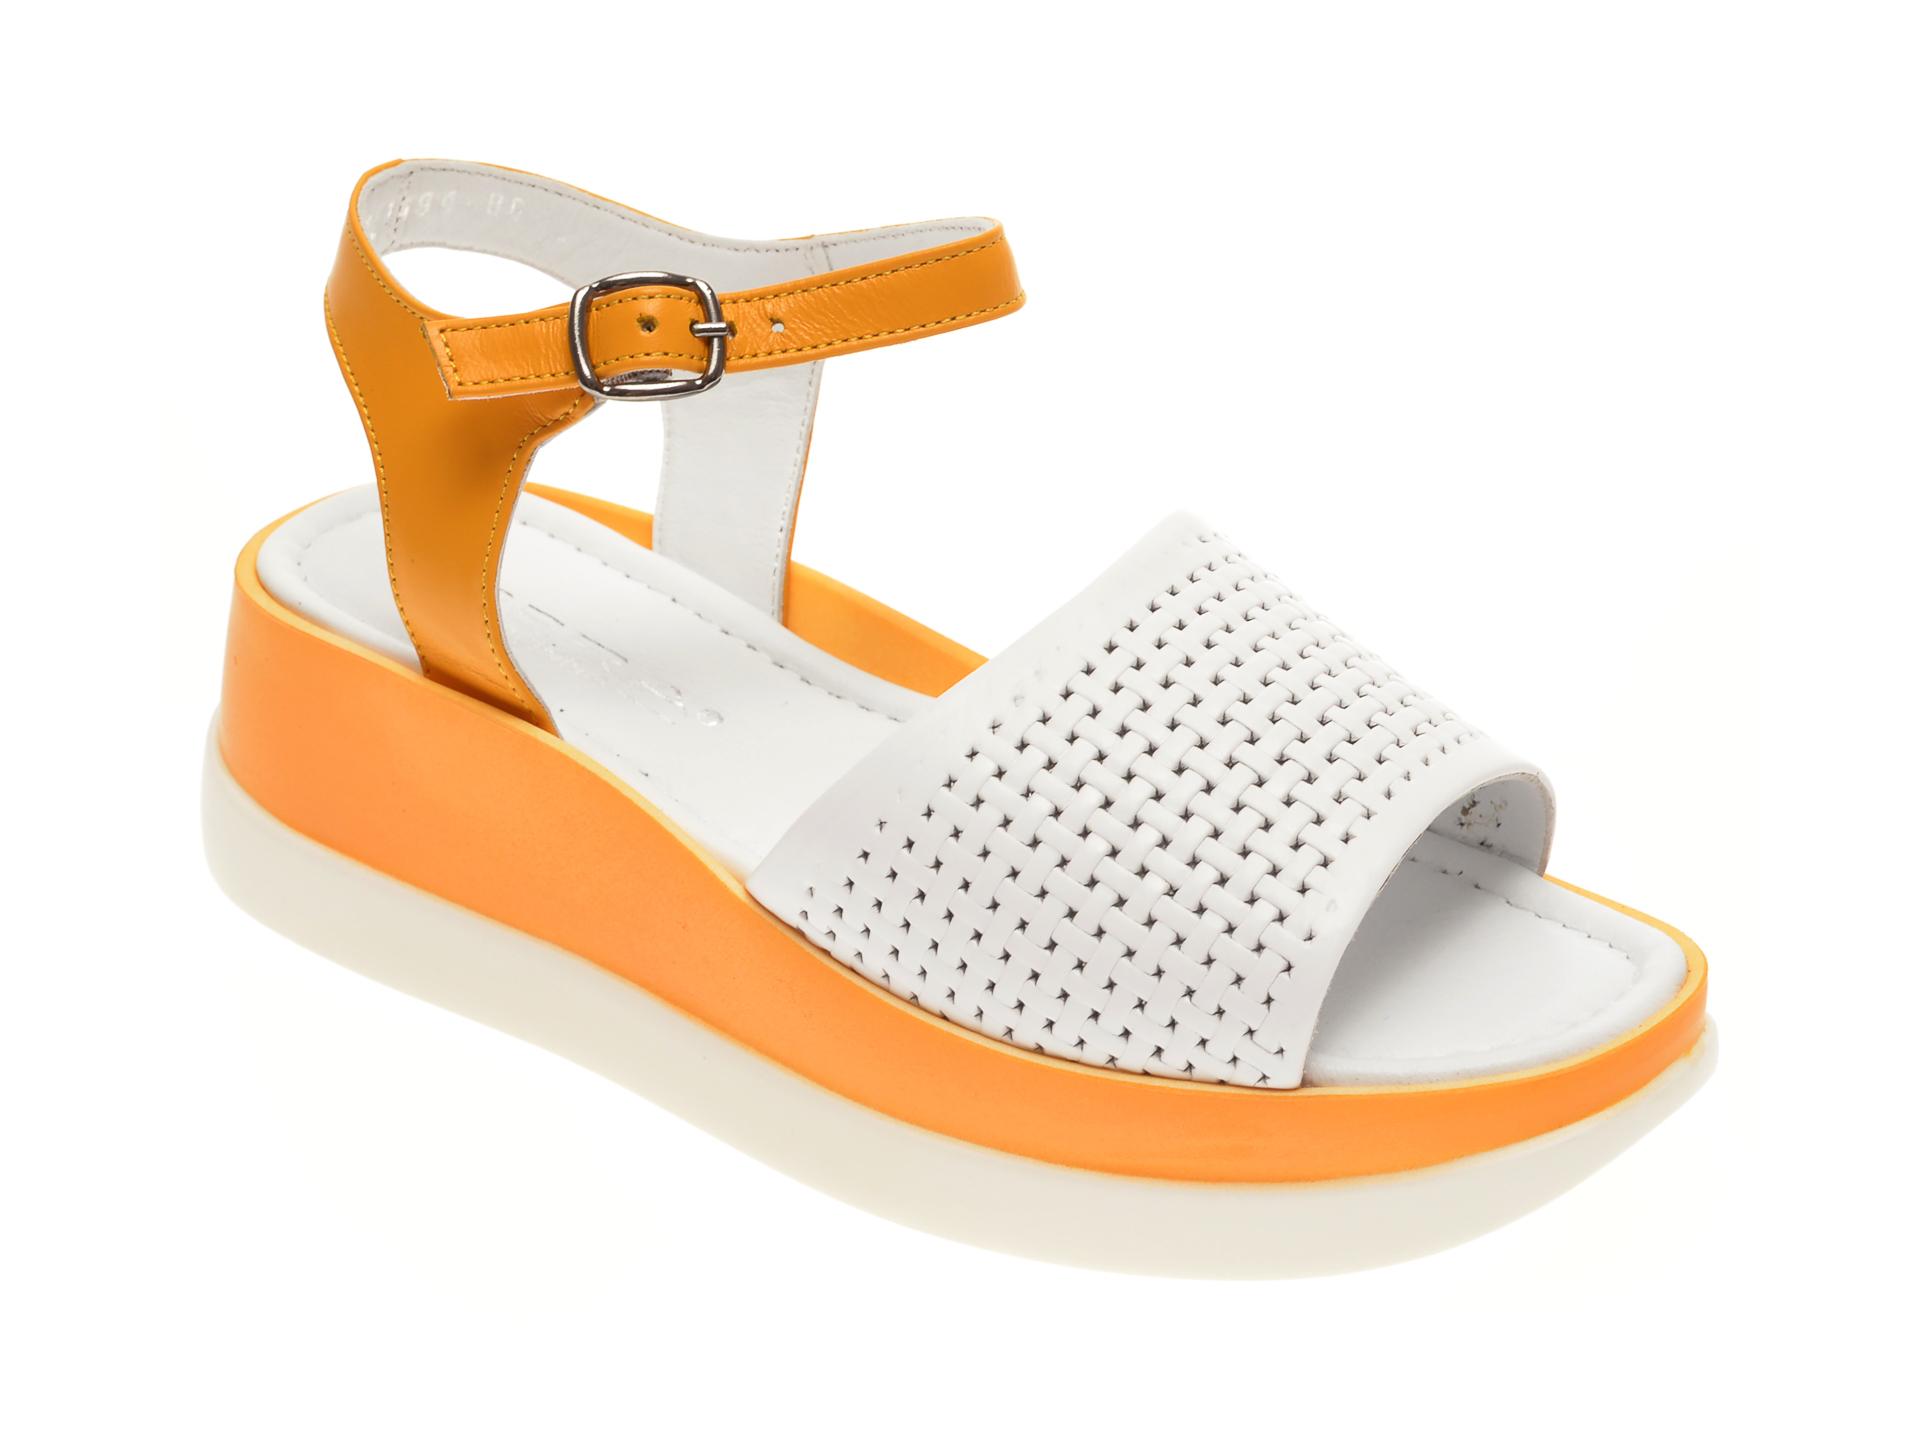 Sandale MISS LIZA albe, 1182488, din piele naturala New